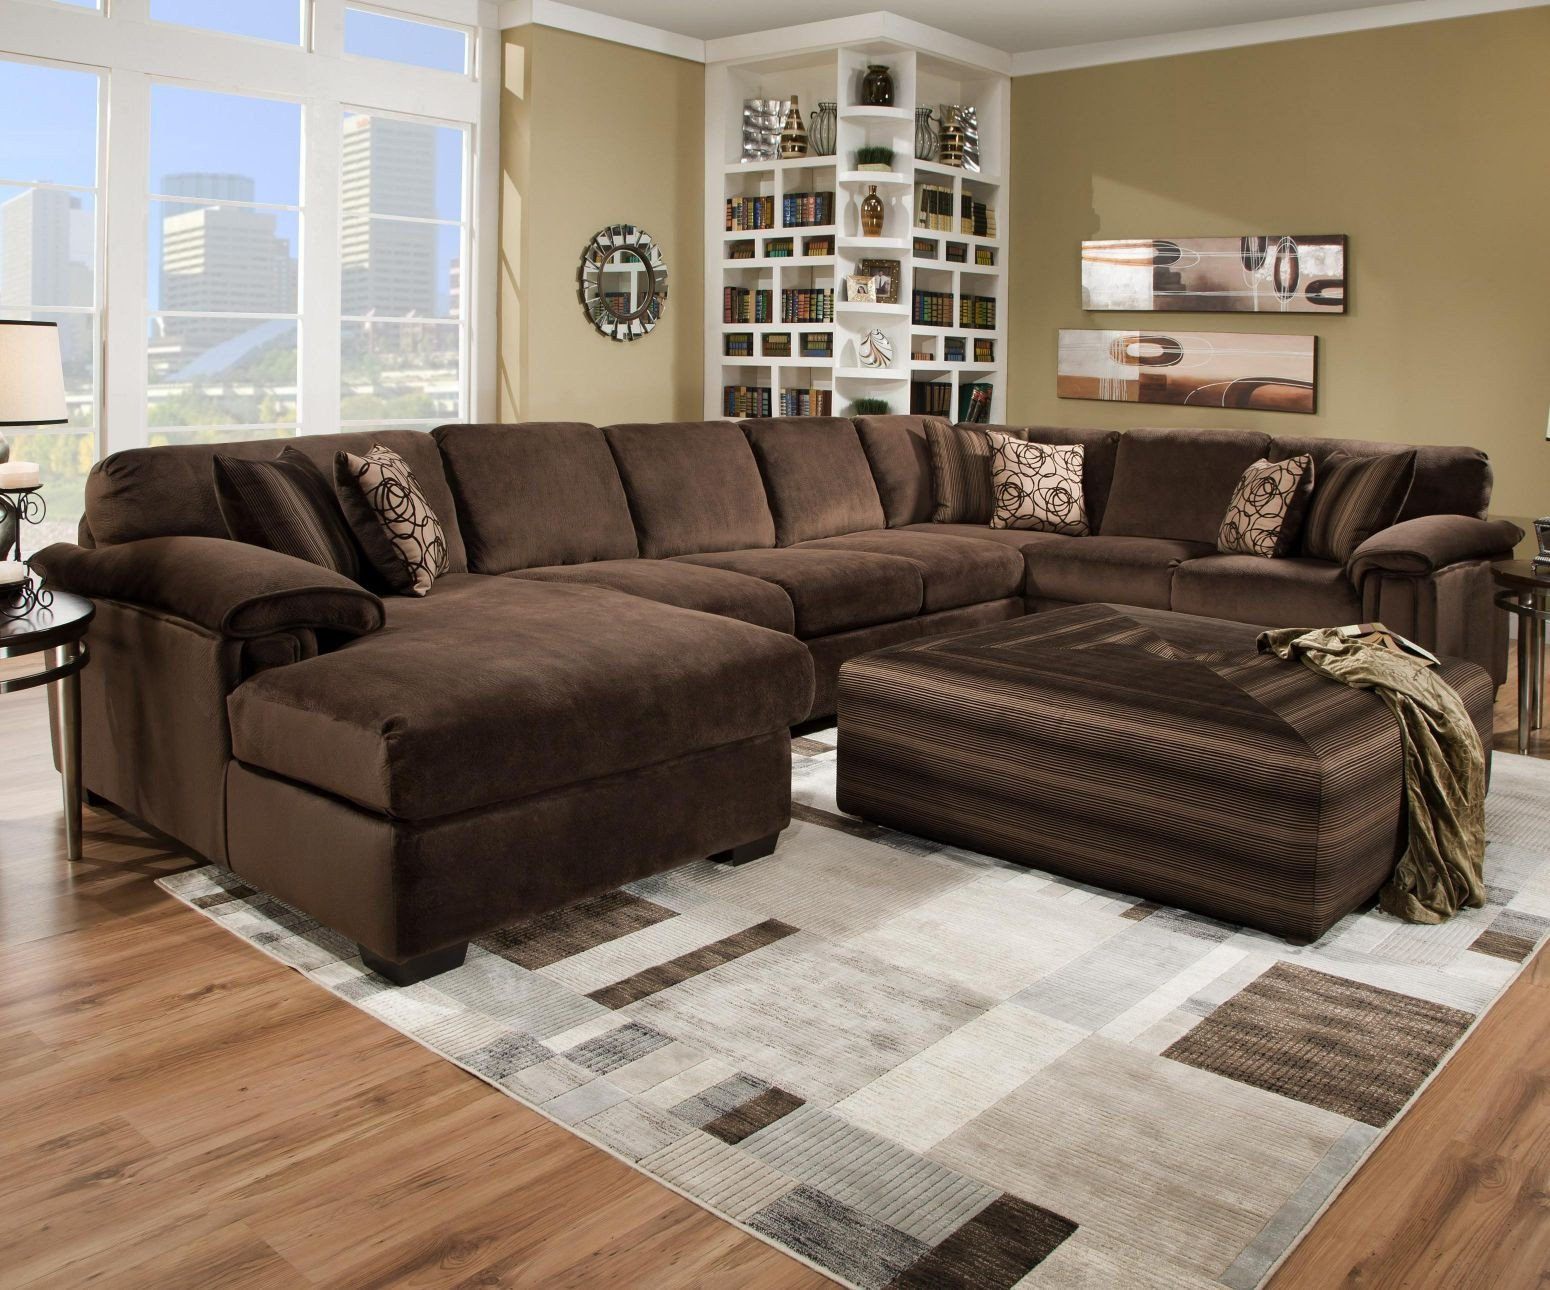 Most Comfortable Living Roomfurniture Furniture Amazing Oversized sofa for Living Room Design